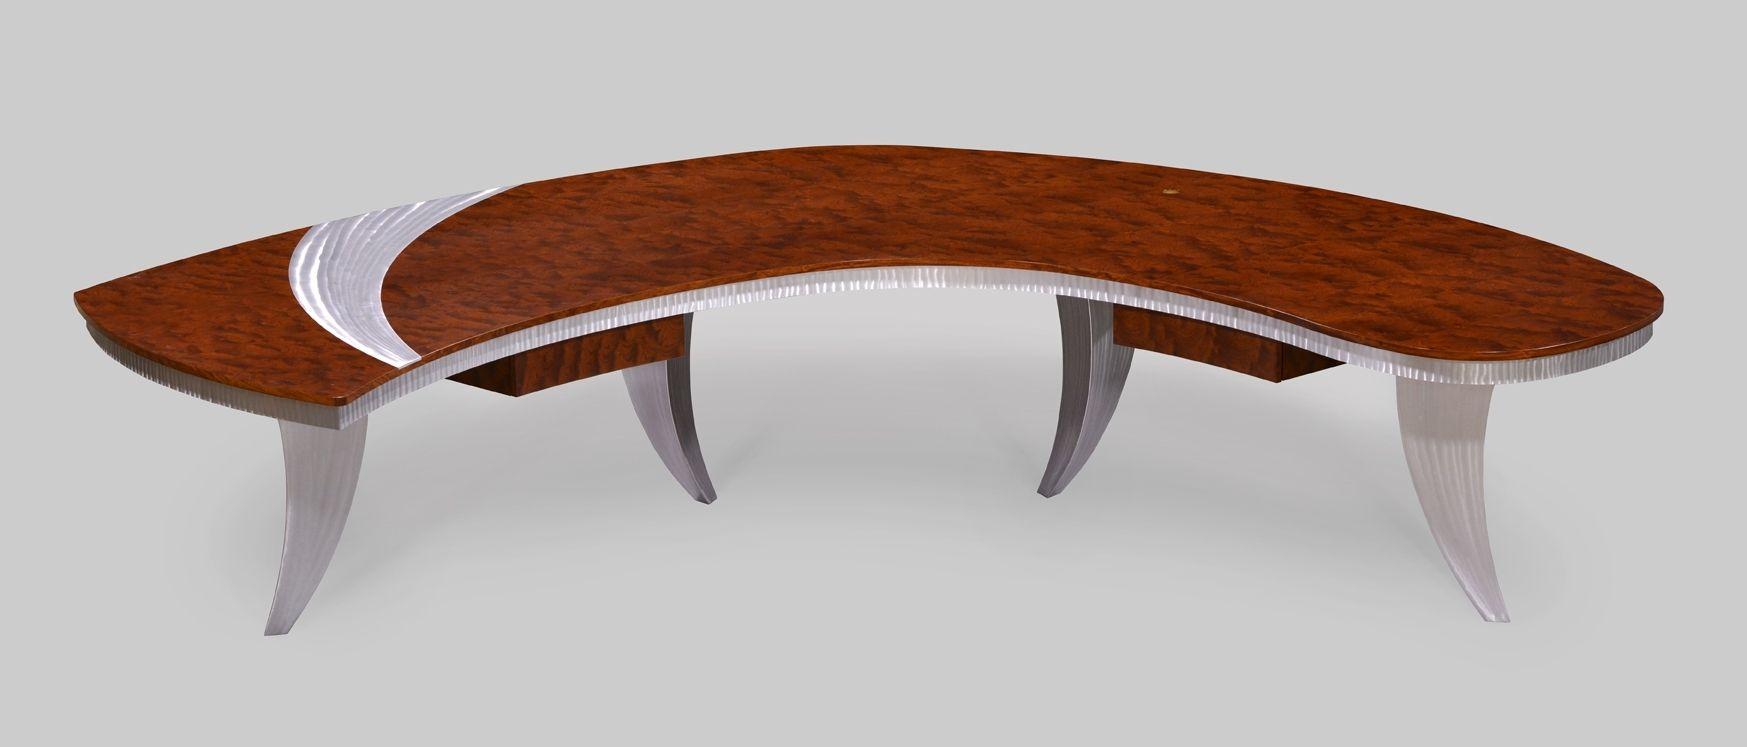 Custom executive desks - Custom Made Paradigm Executive Desk In Pommele Bubinga Custom Aluminum Legs